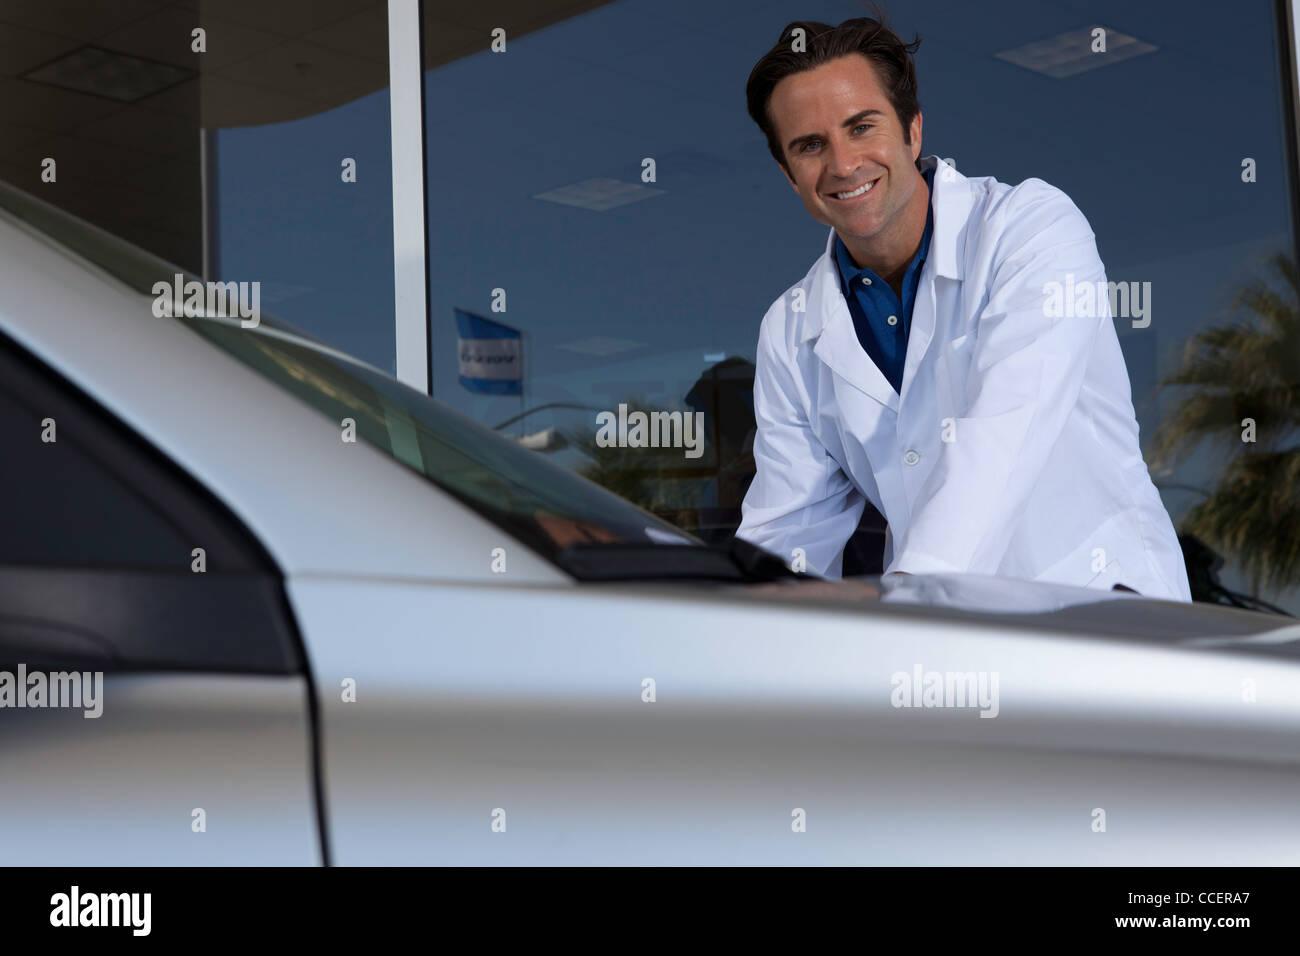 Fröhliche Autohändler stehen neben dem Auto Stockbild